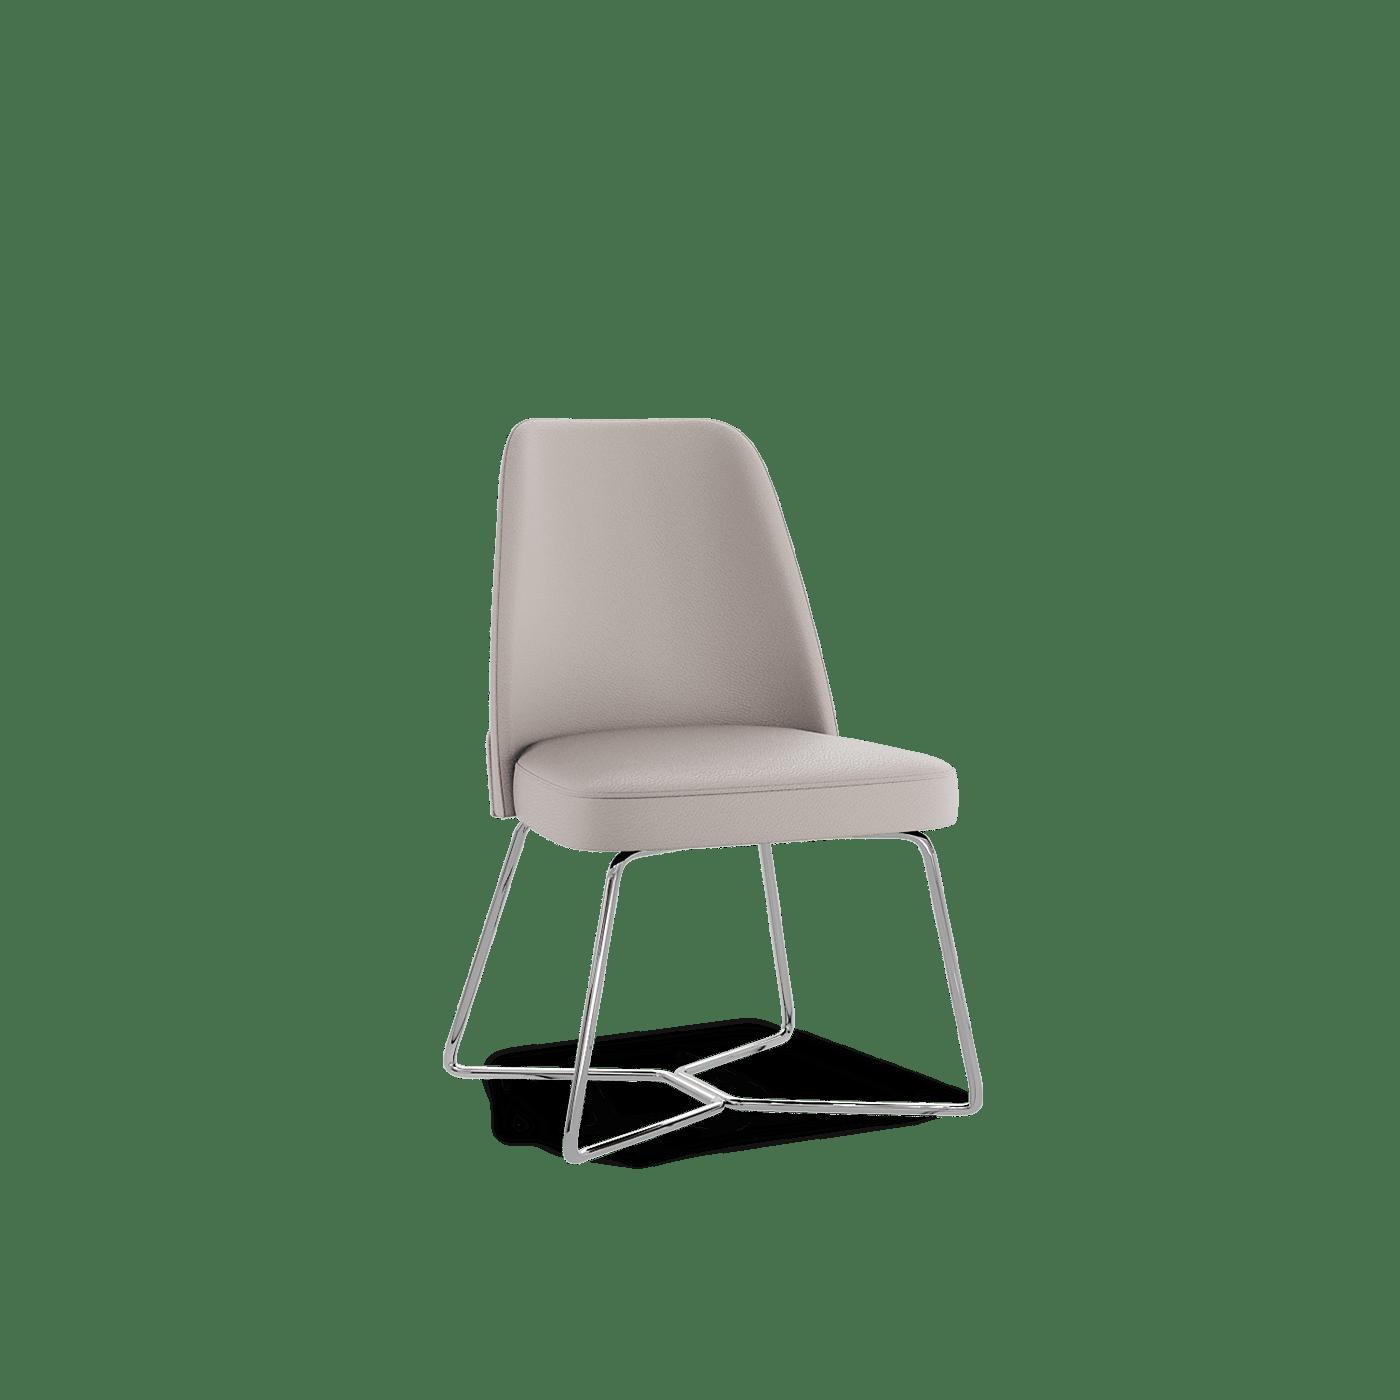 Gard Chair